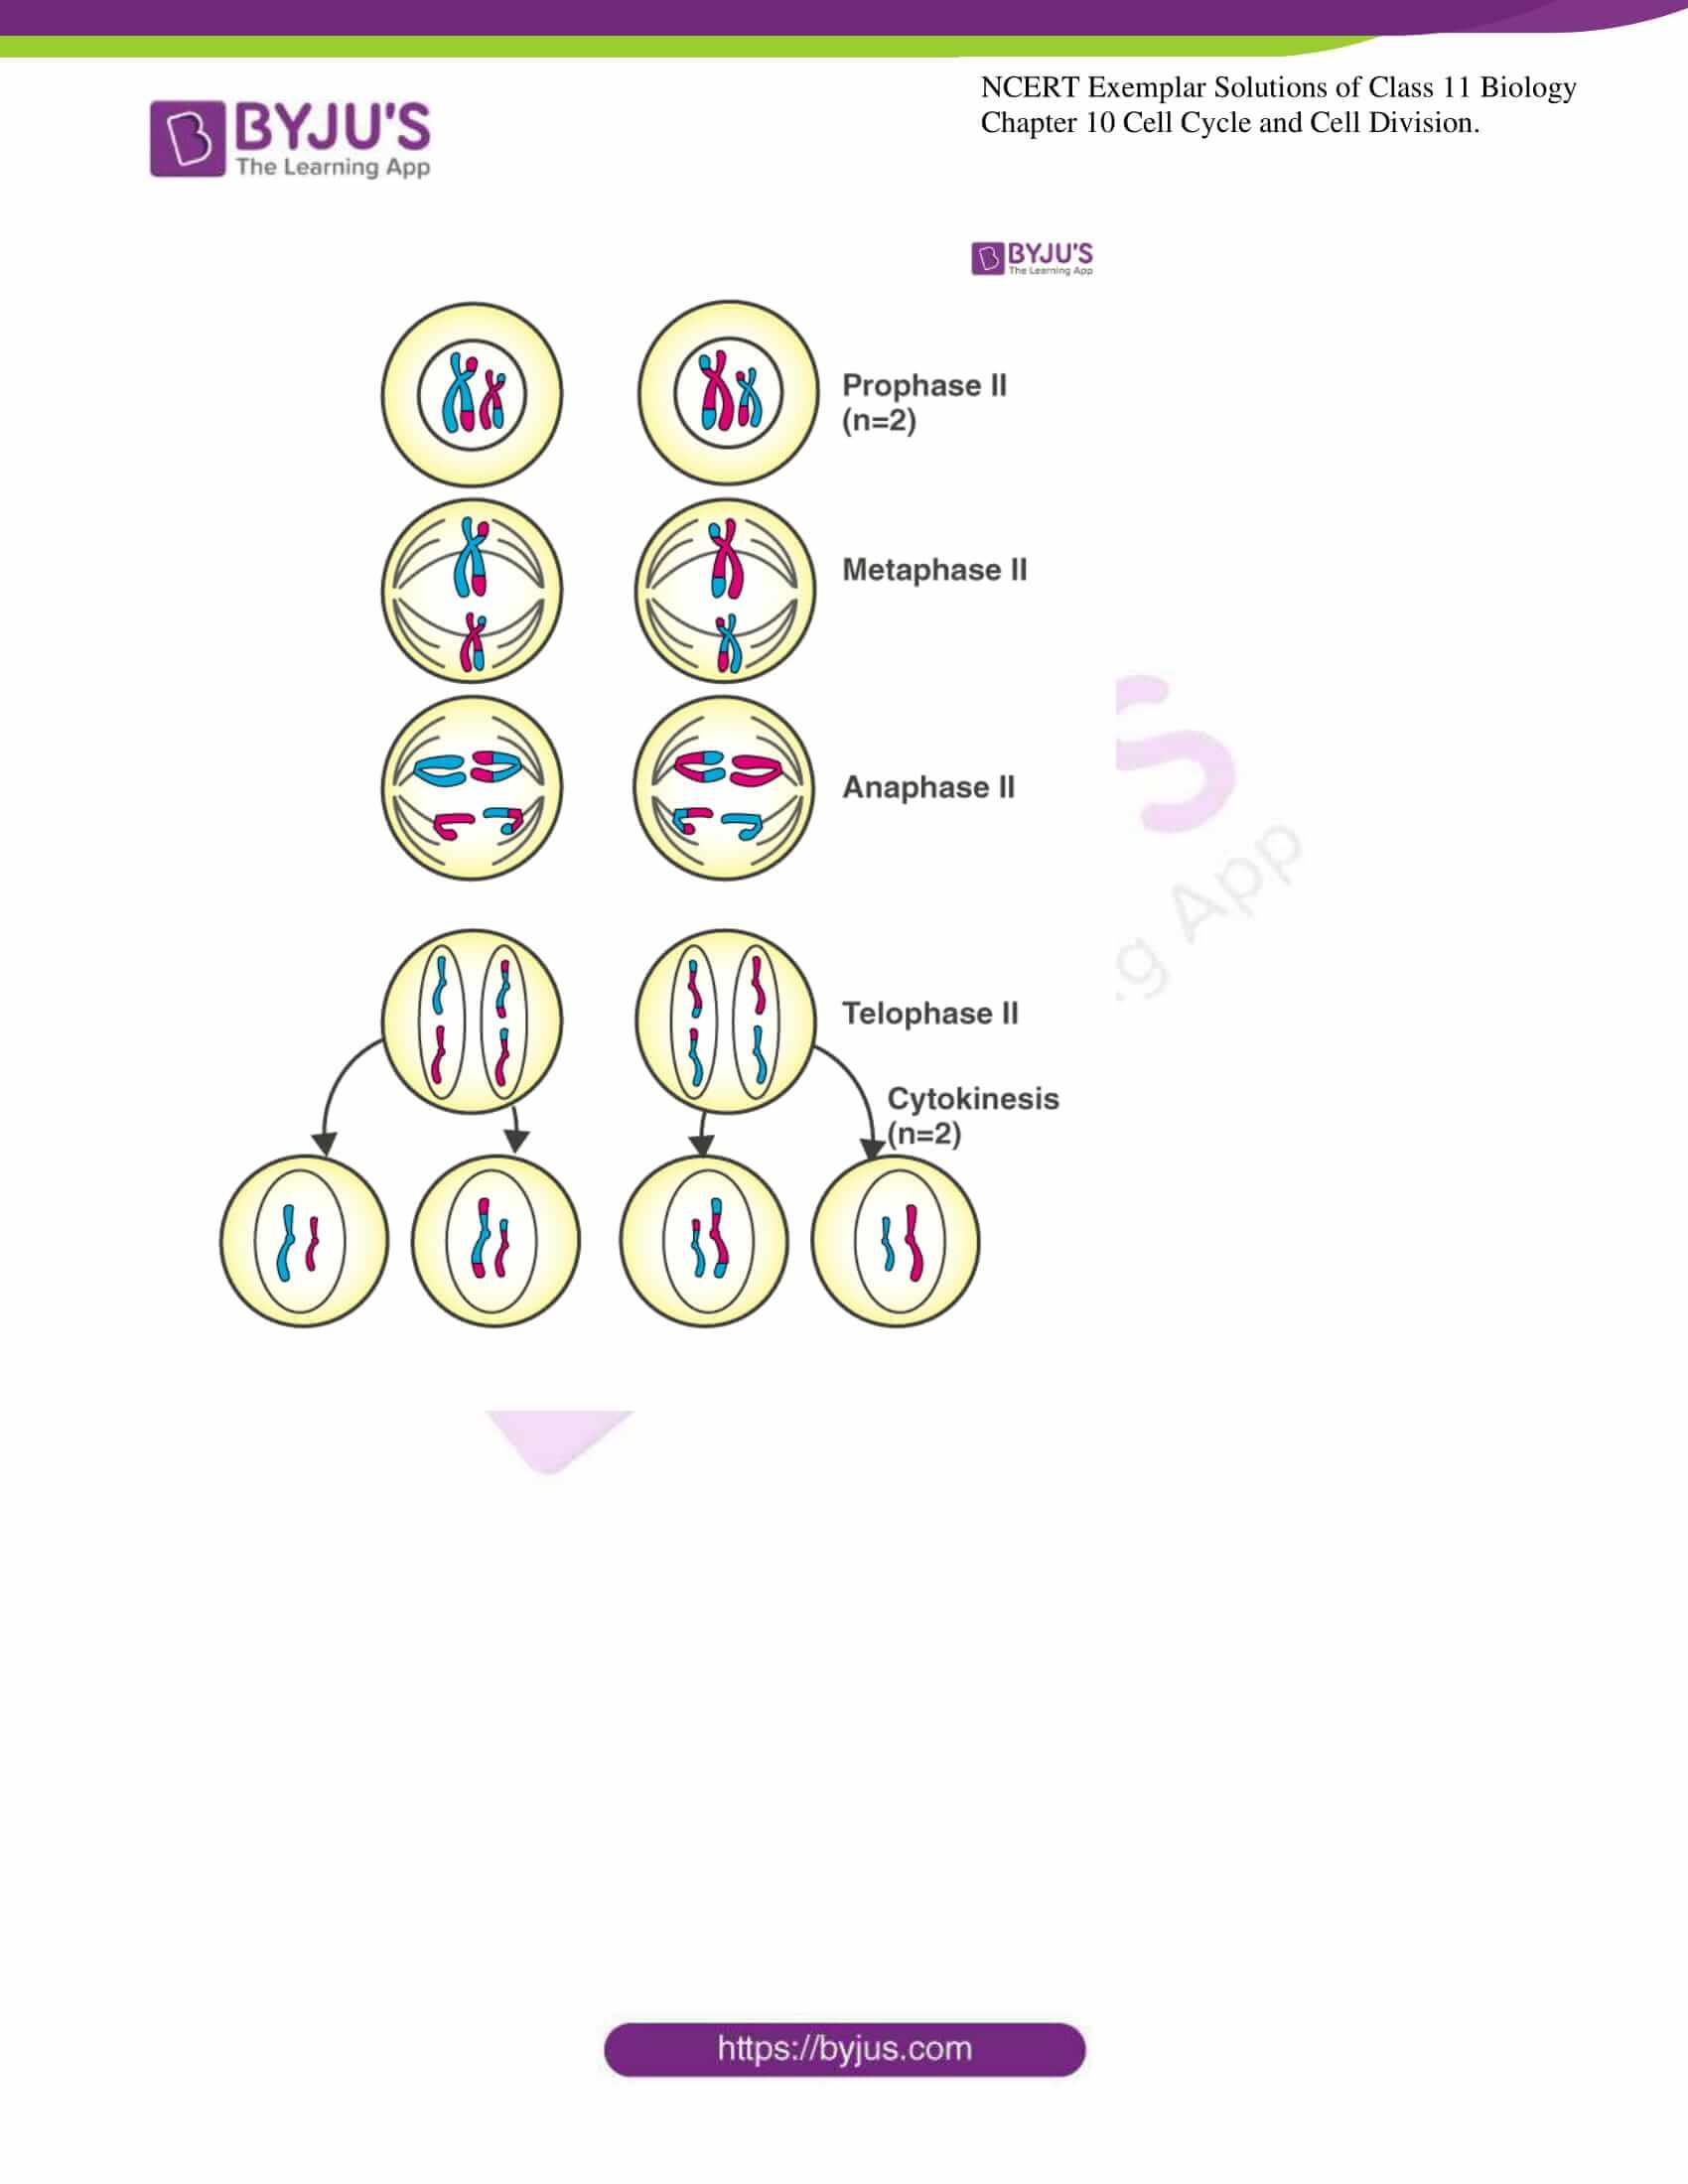 ncert exemplar solutions for class 11 bio chapter 10 9